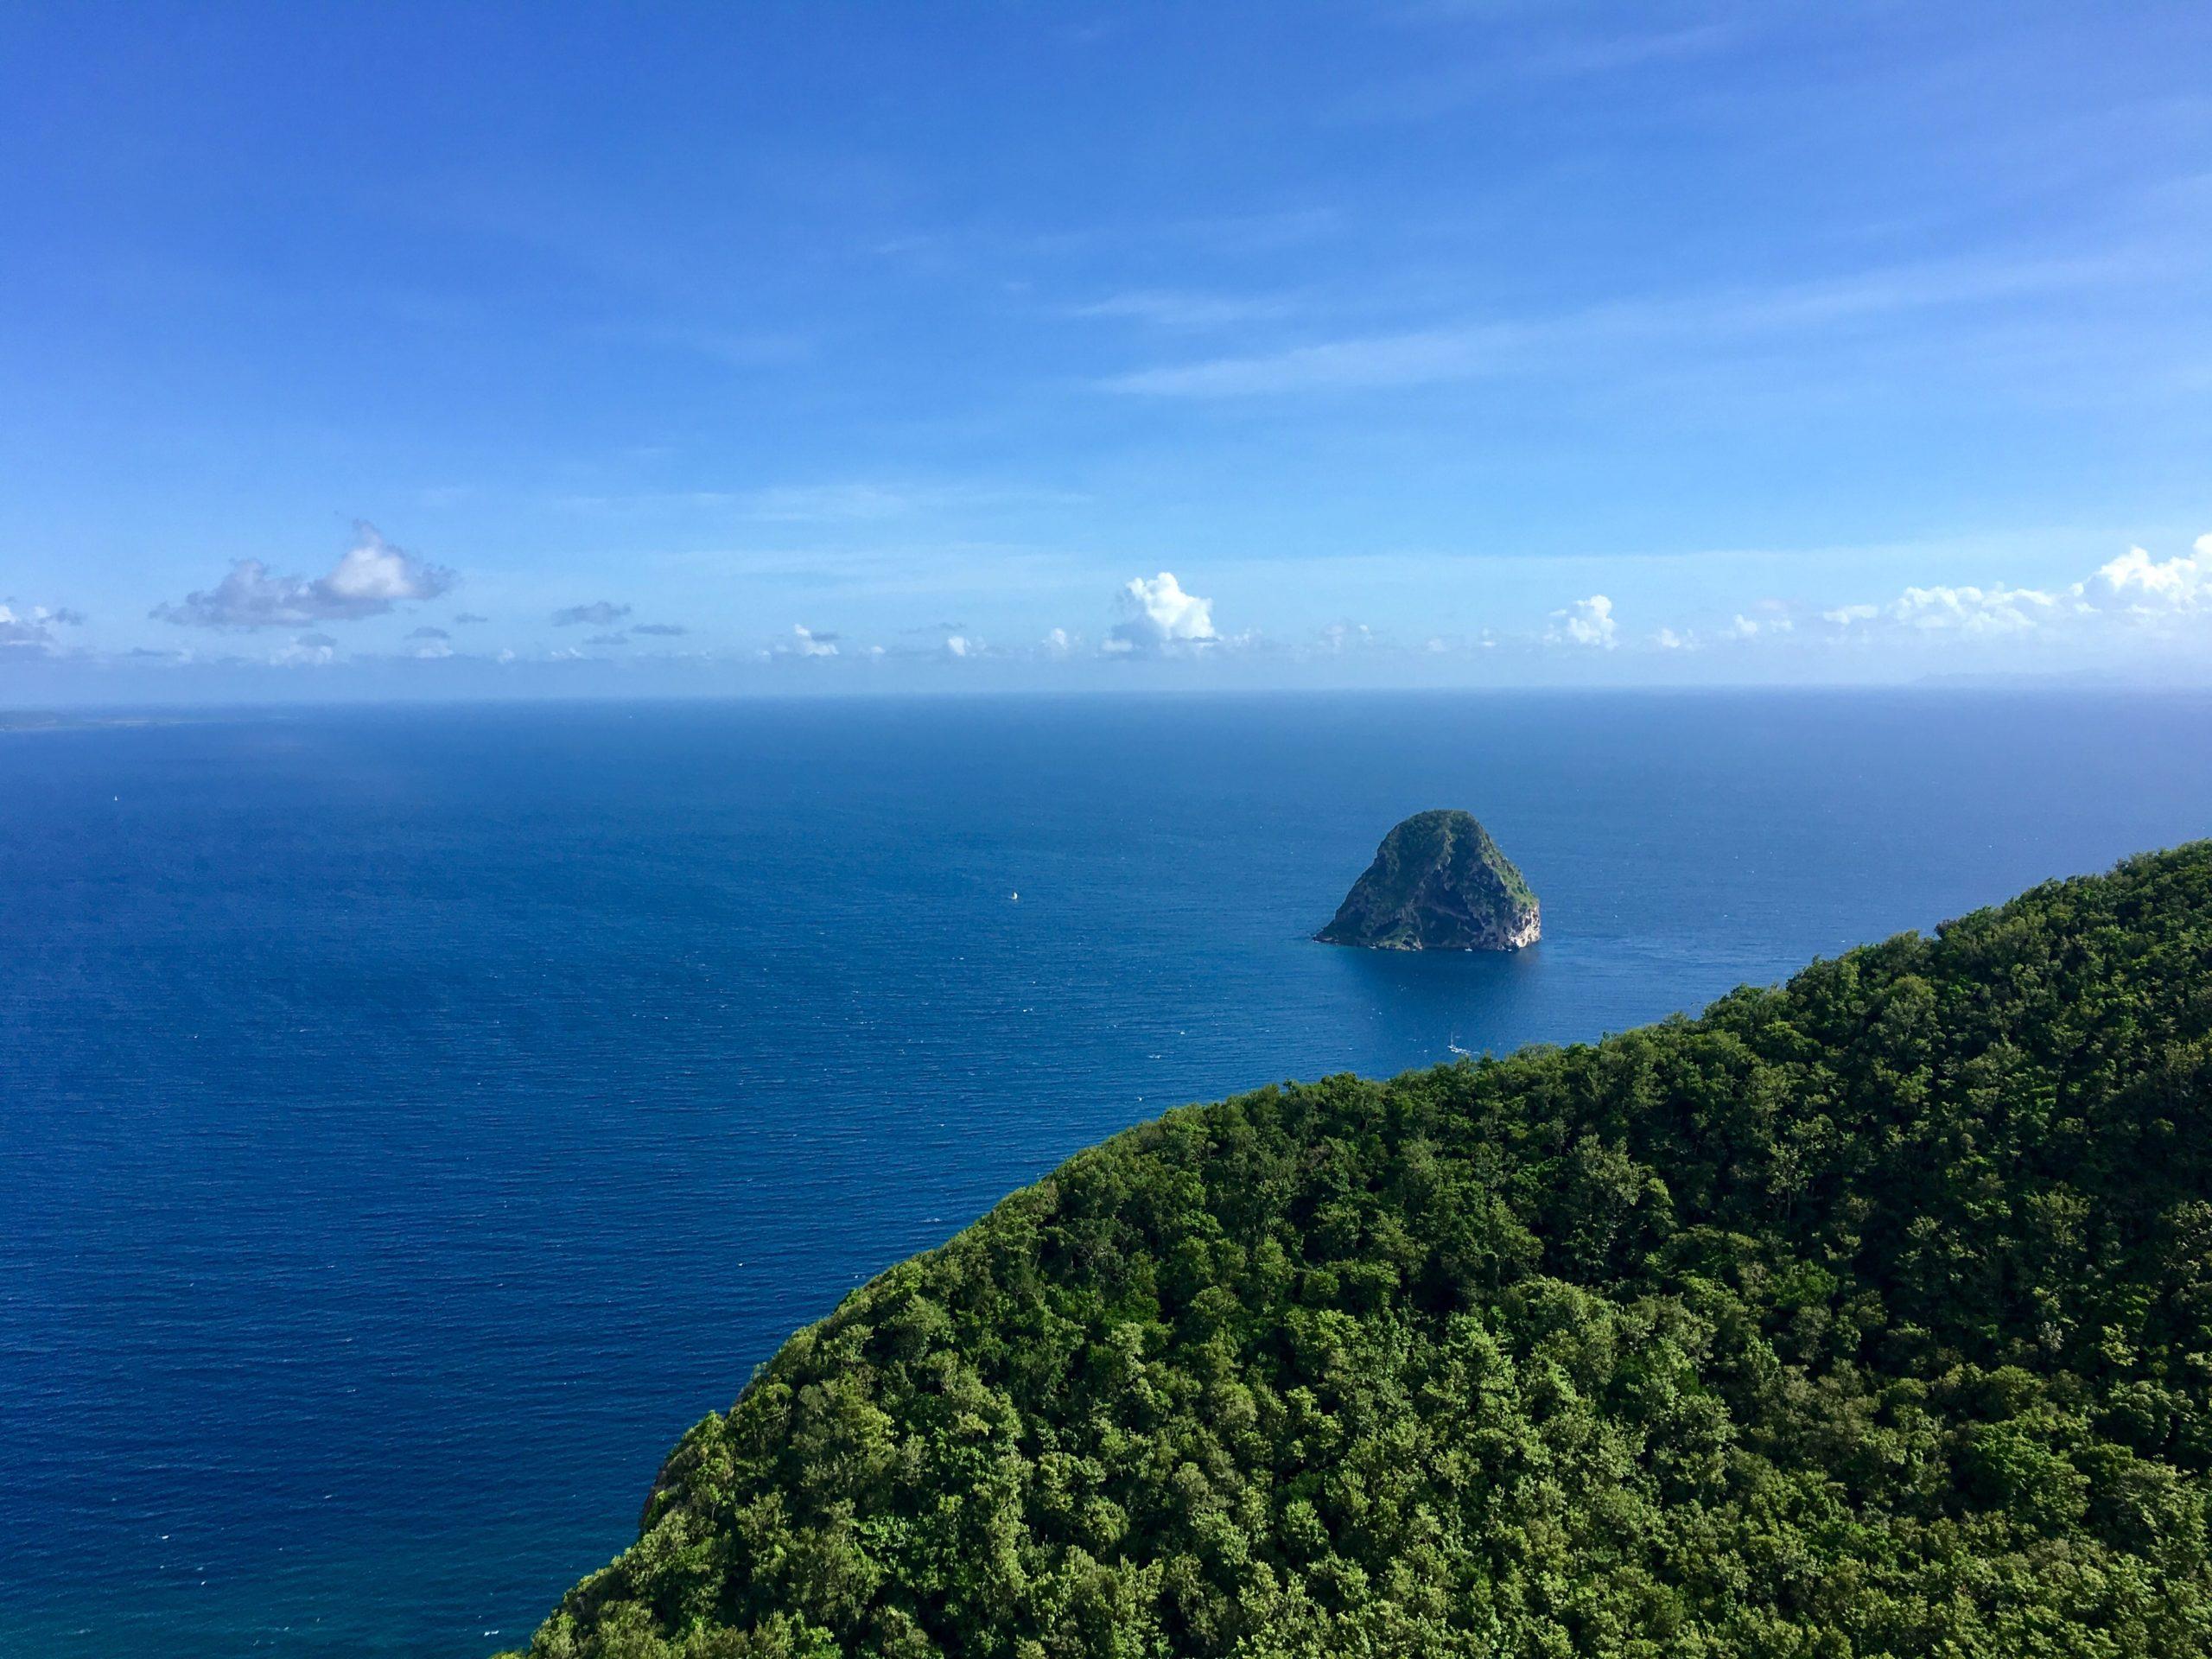 green trees island